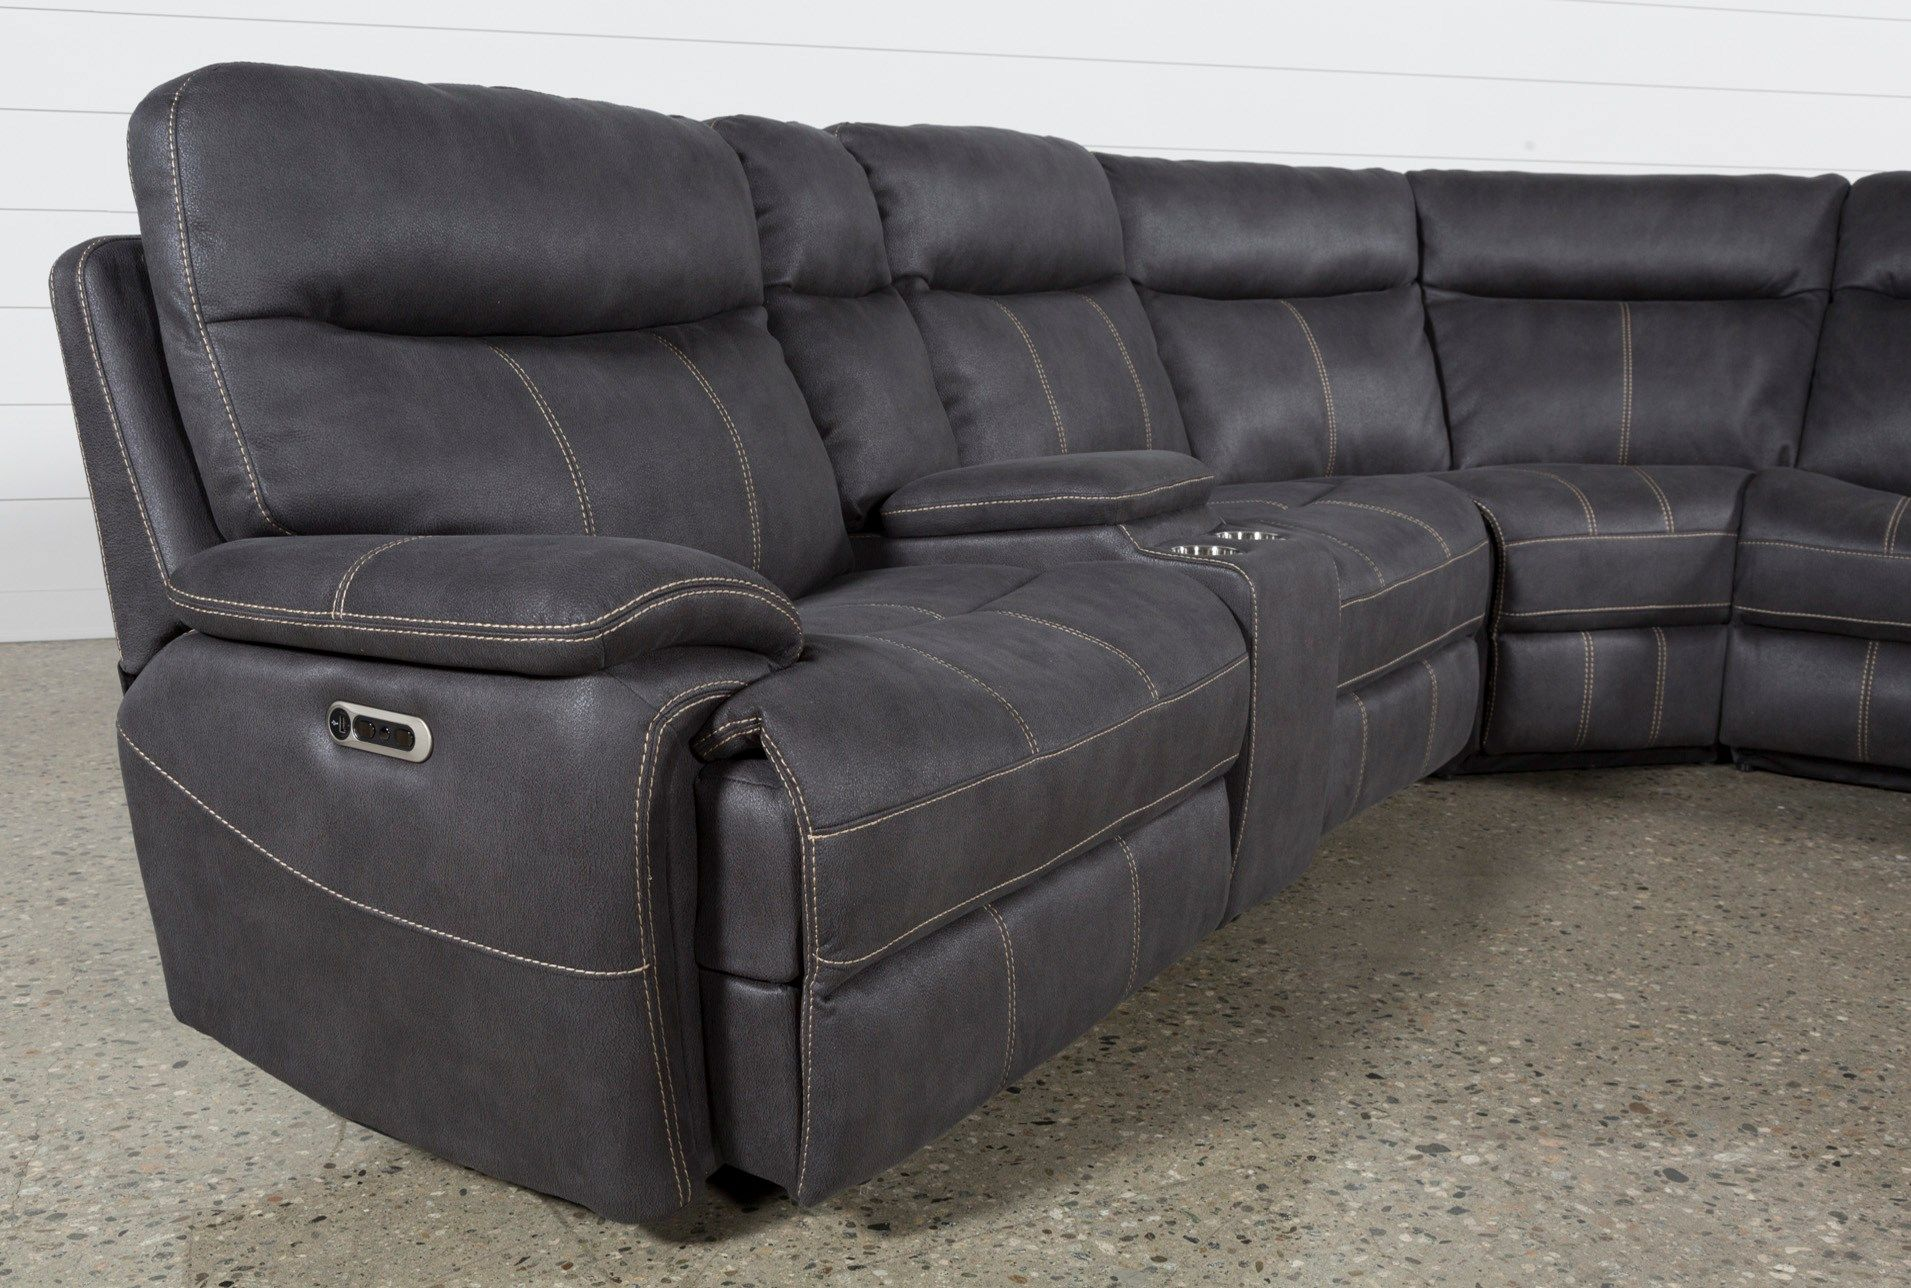 Denali Charcoal Grey 6 Piece Reclining Sectional W 2 Power Headrests Left Reclining Sectional Power Reclining Sectional Sofa Best Leather Sofa